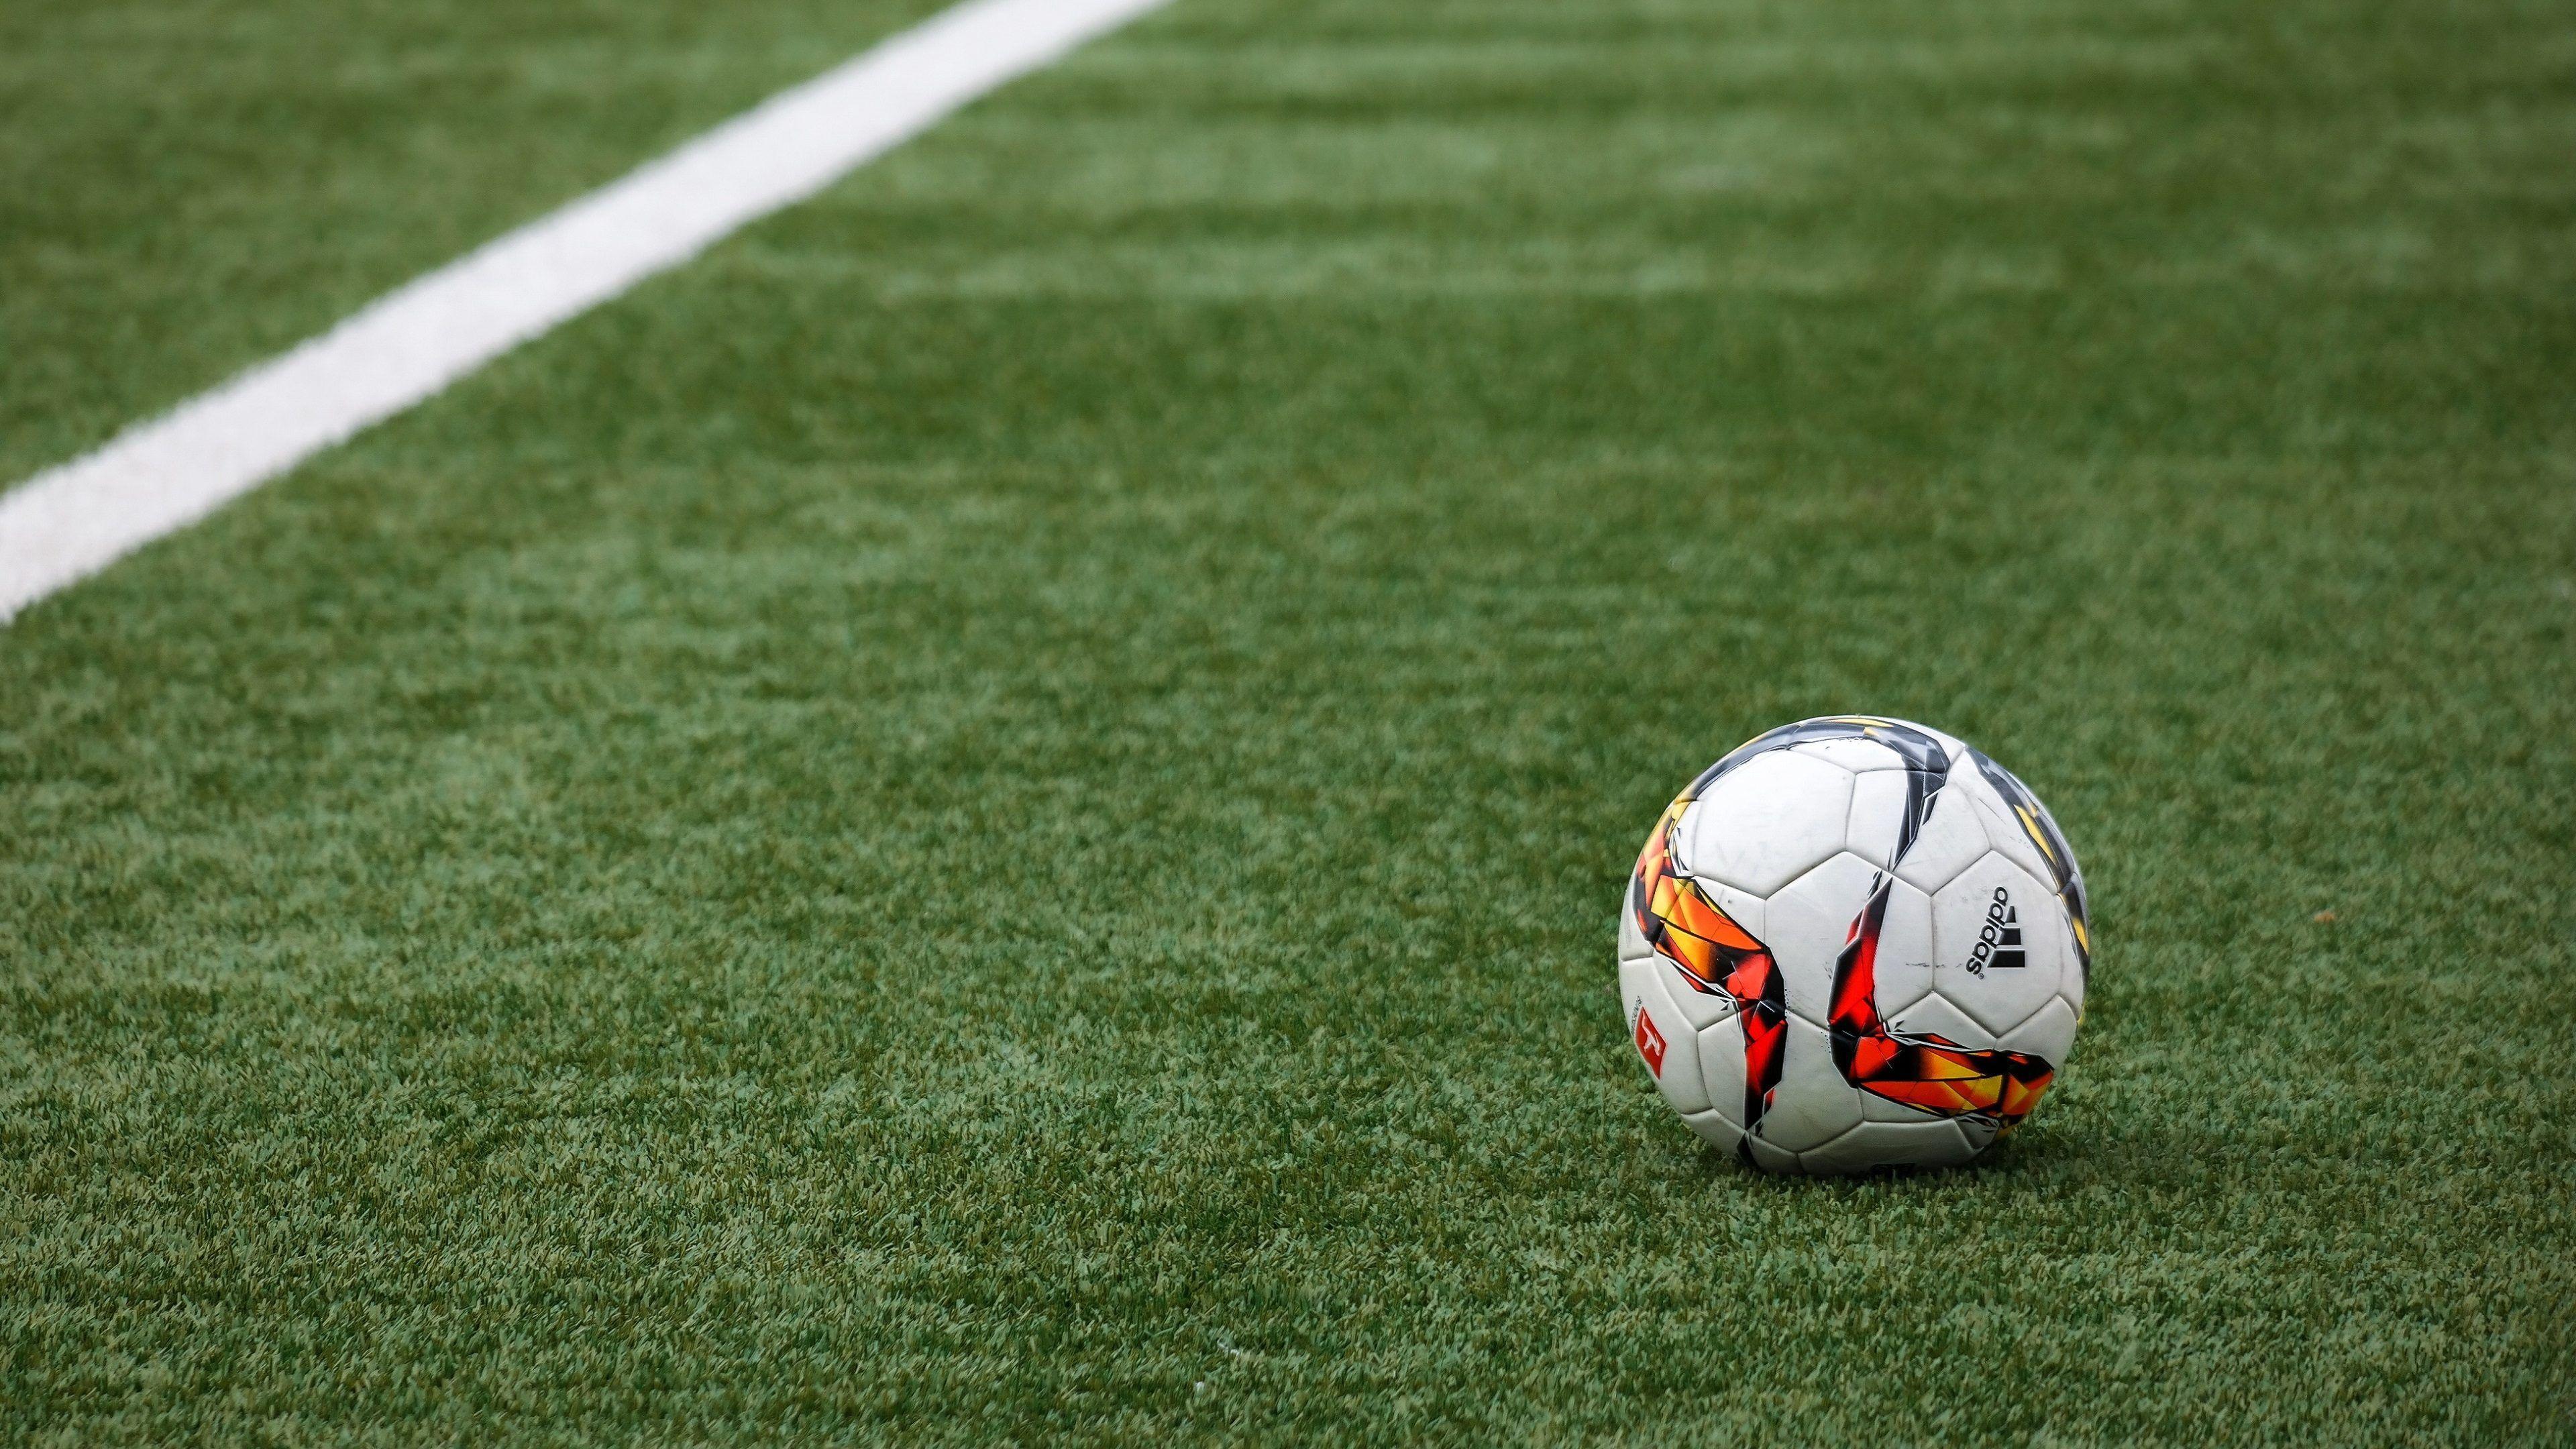 4k Football Wallpapers Top Free 4k Football Backgrounds Wallpaperaccess